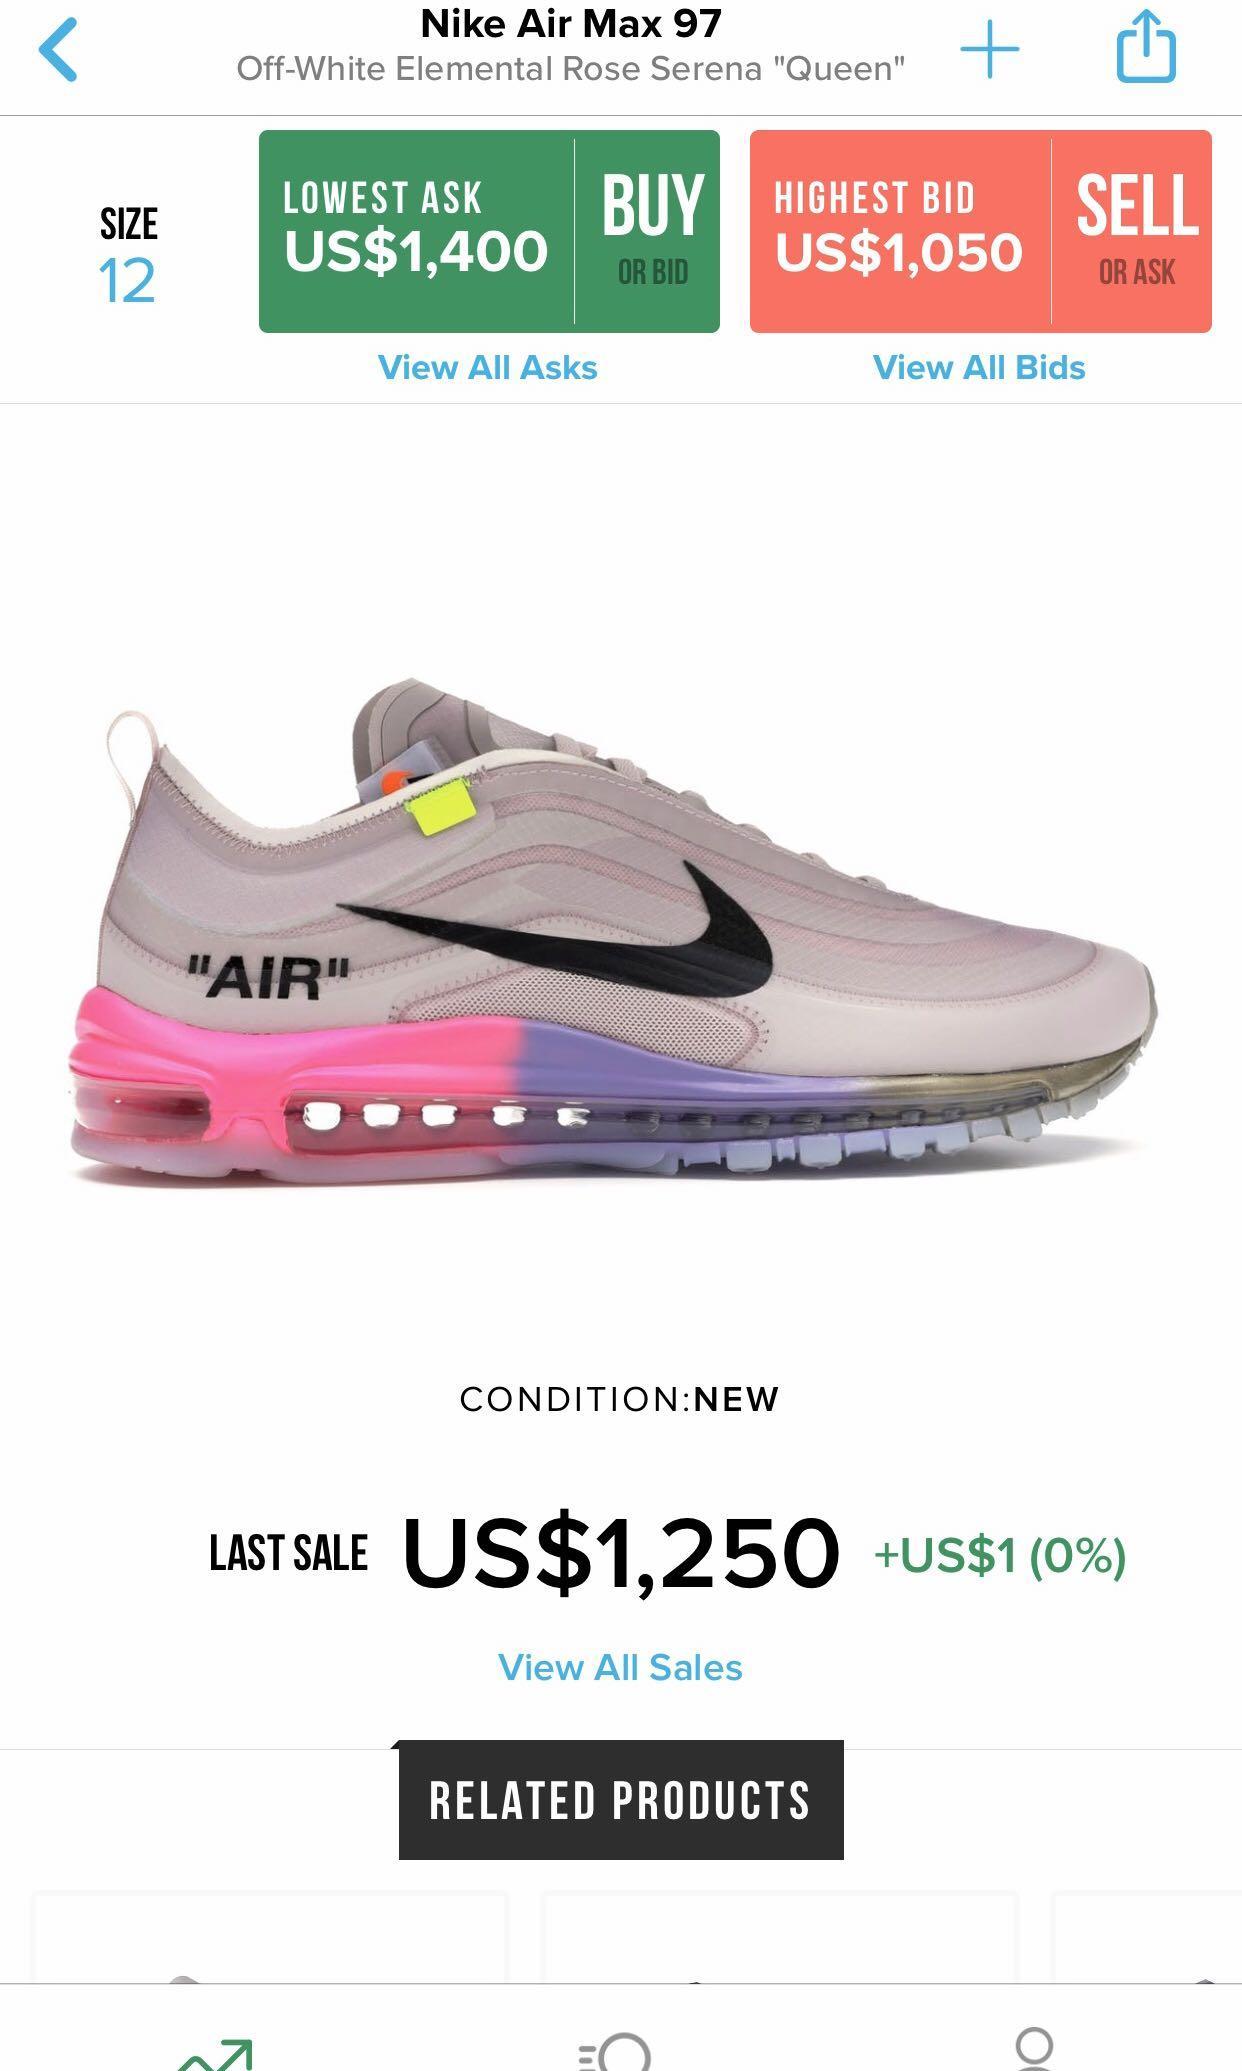 dispensa Subtropicale dettagli  Serena Williams X Off White X Nike Air Max 97, Men's Fashion, Footwear,  Sneakers on Carousell